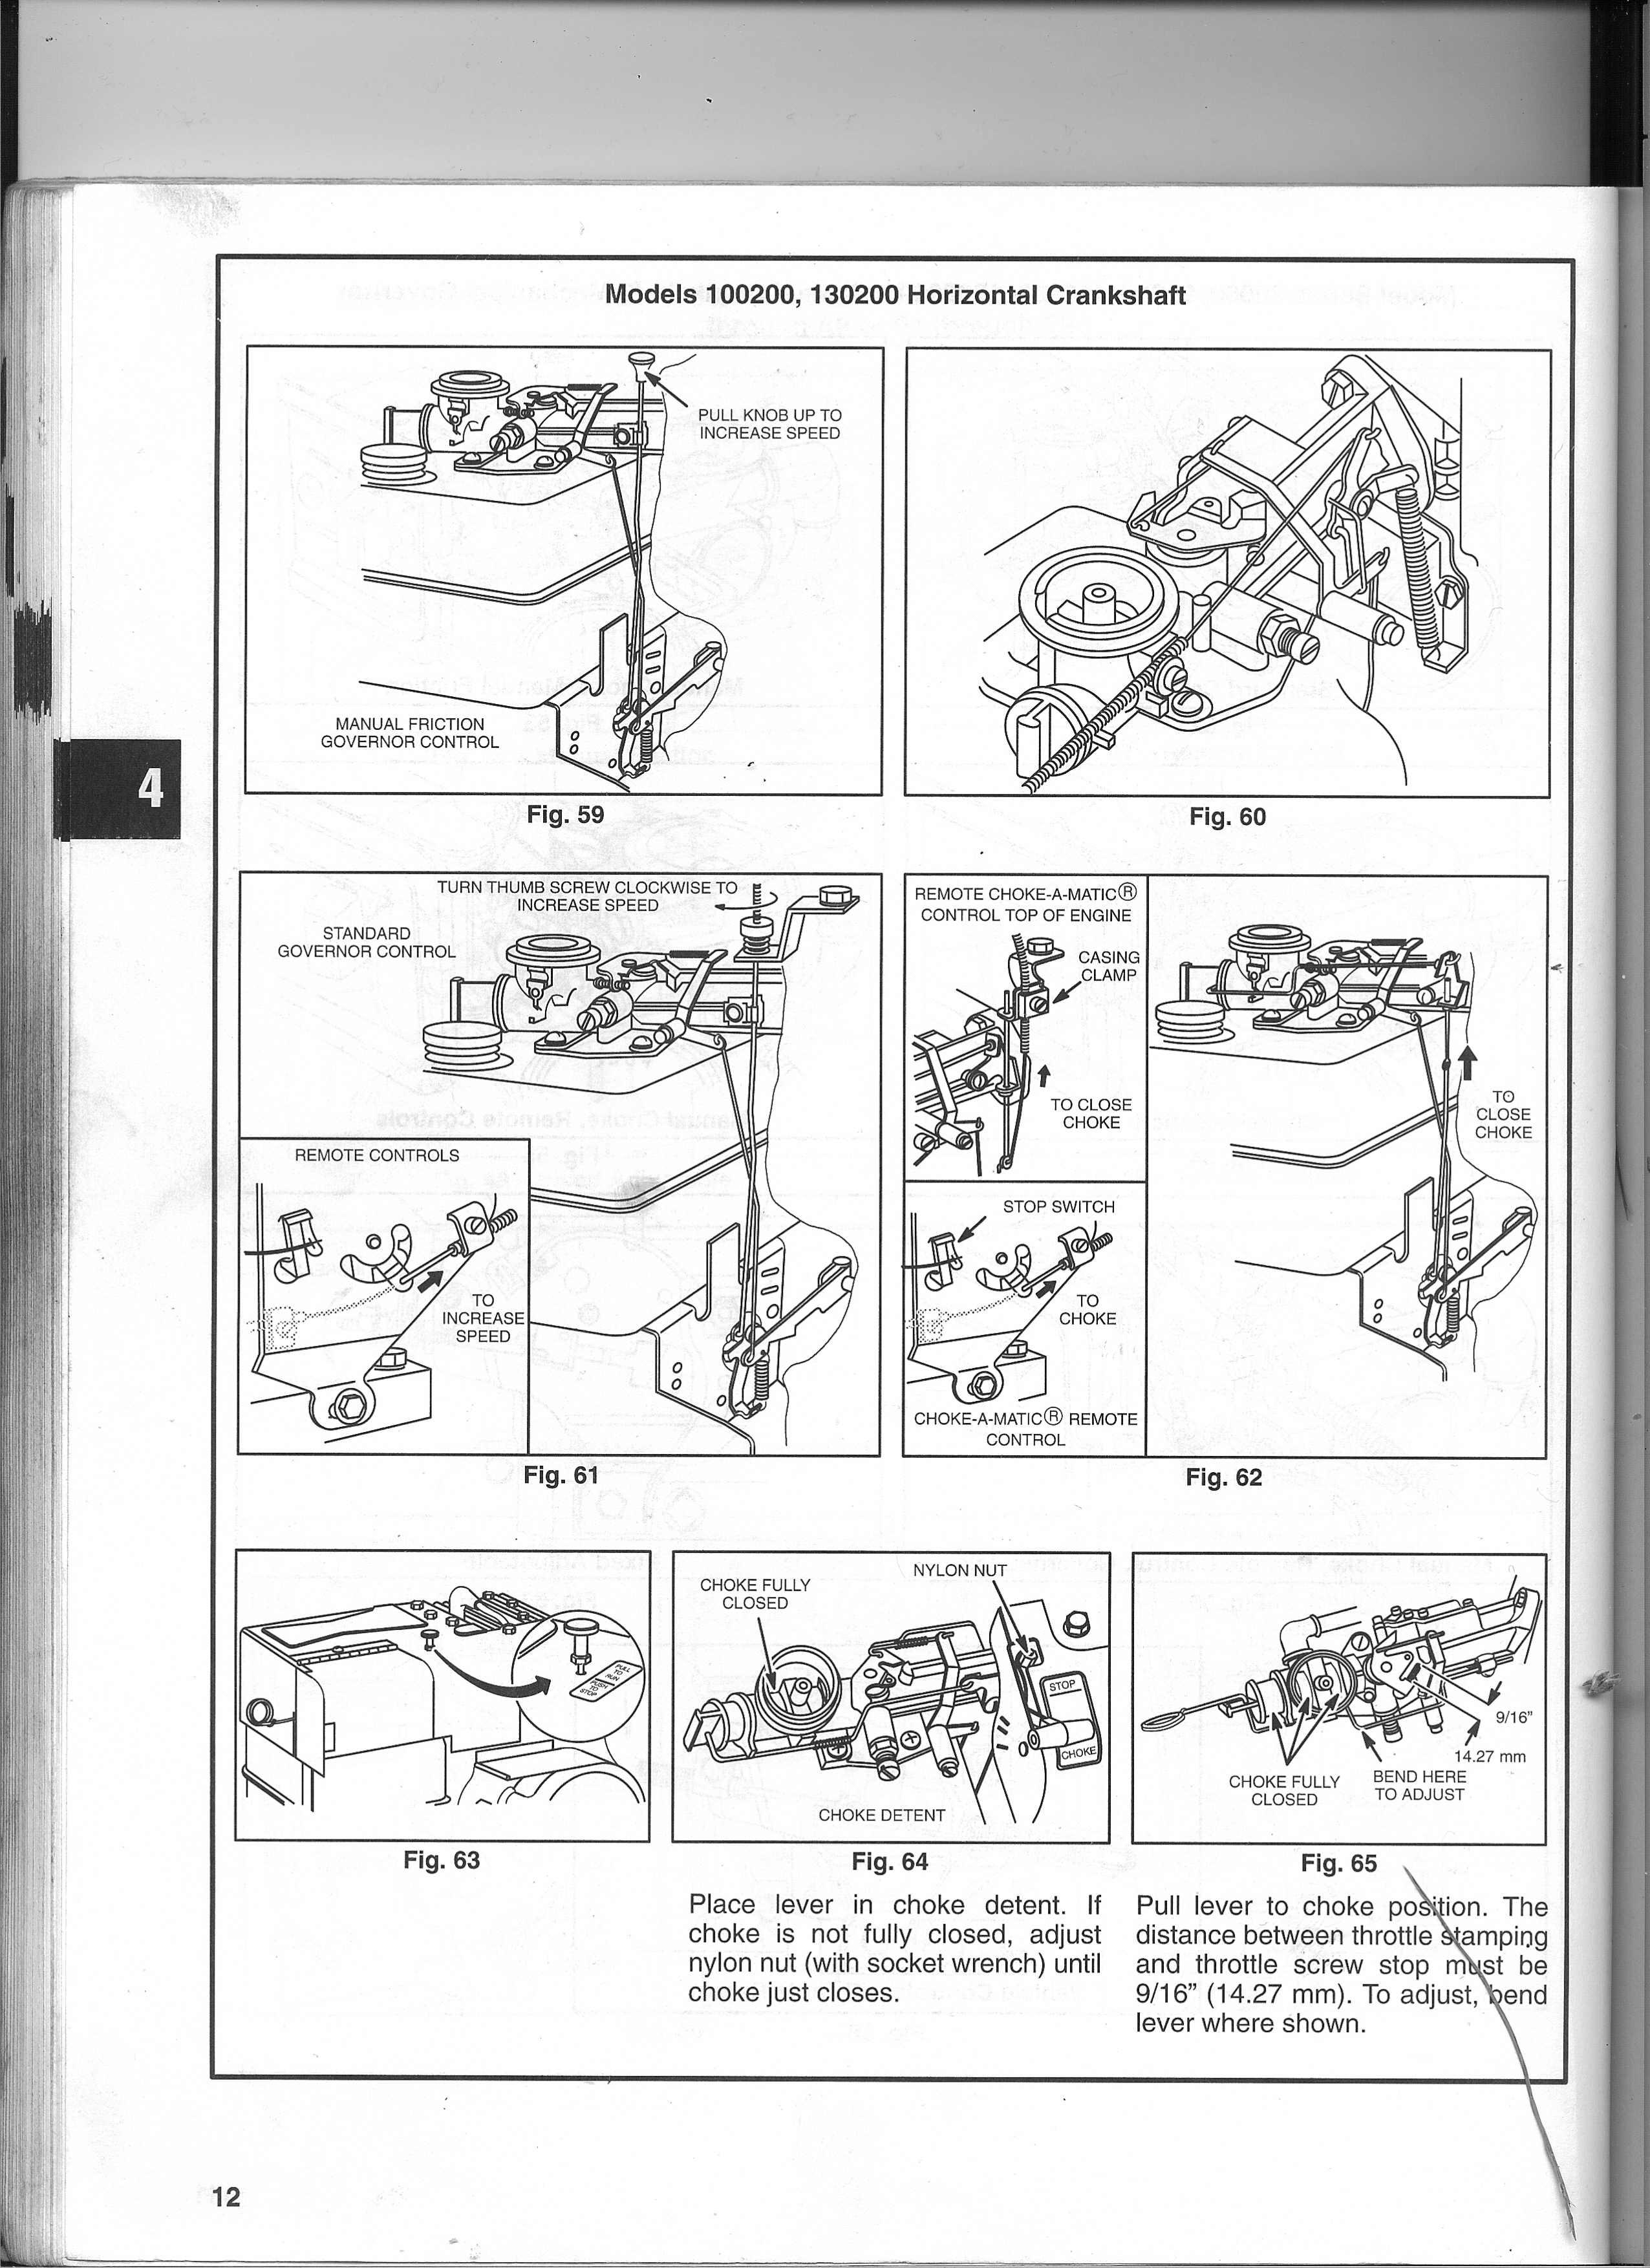 10 Hp Briggs And Stratton Wiring Diagram Great Design Of 24 Engine Kohler Carburetor Free